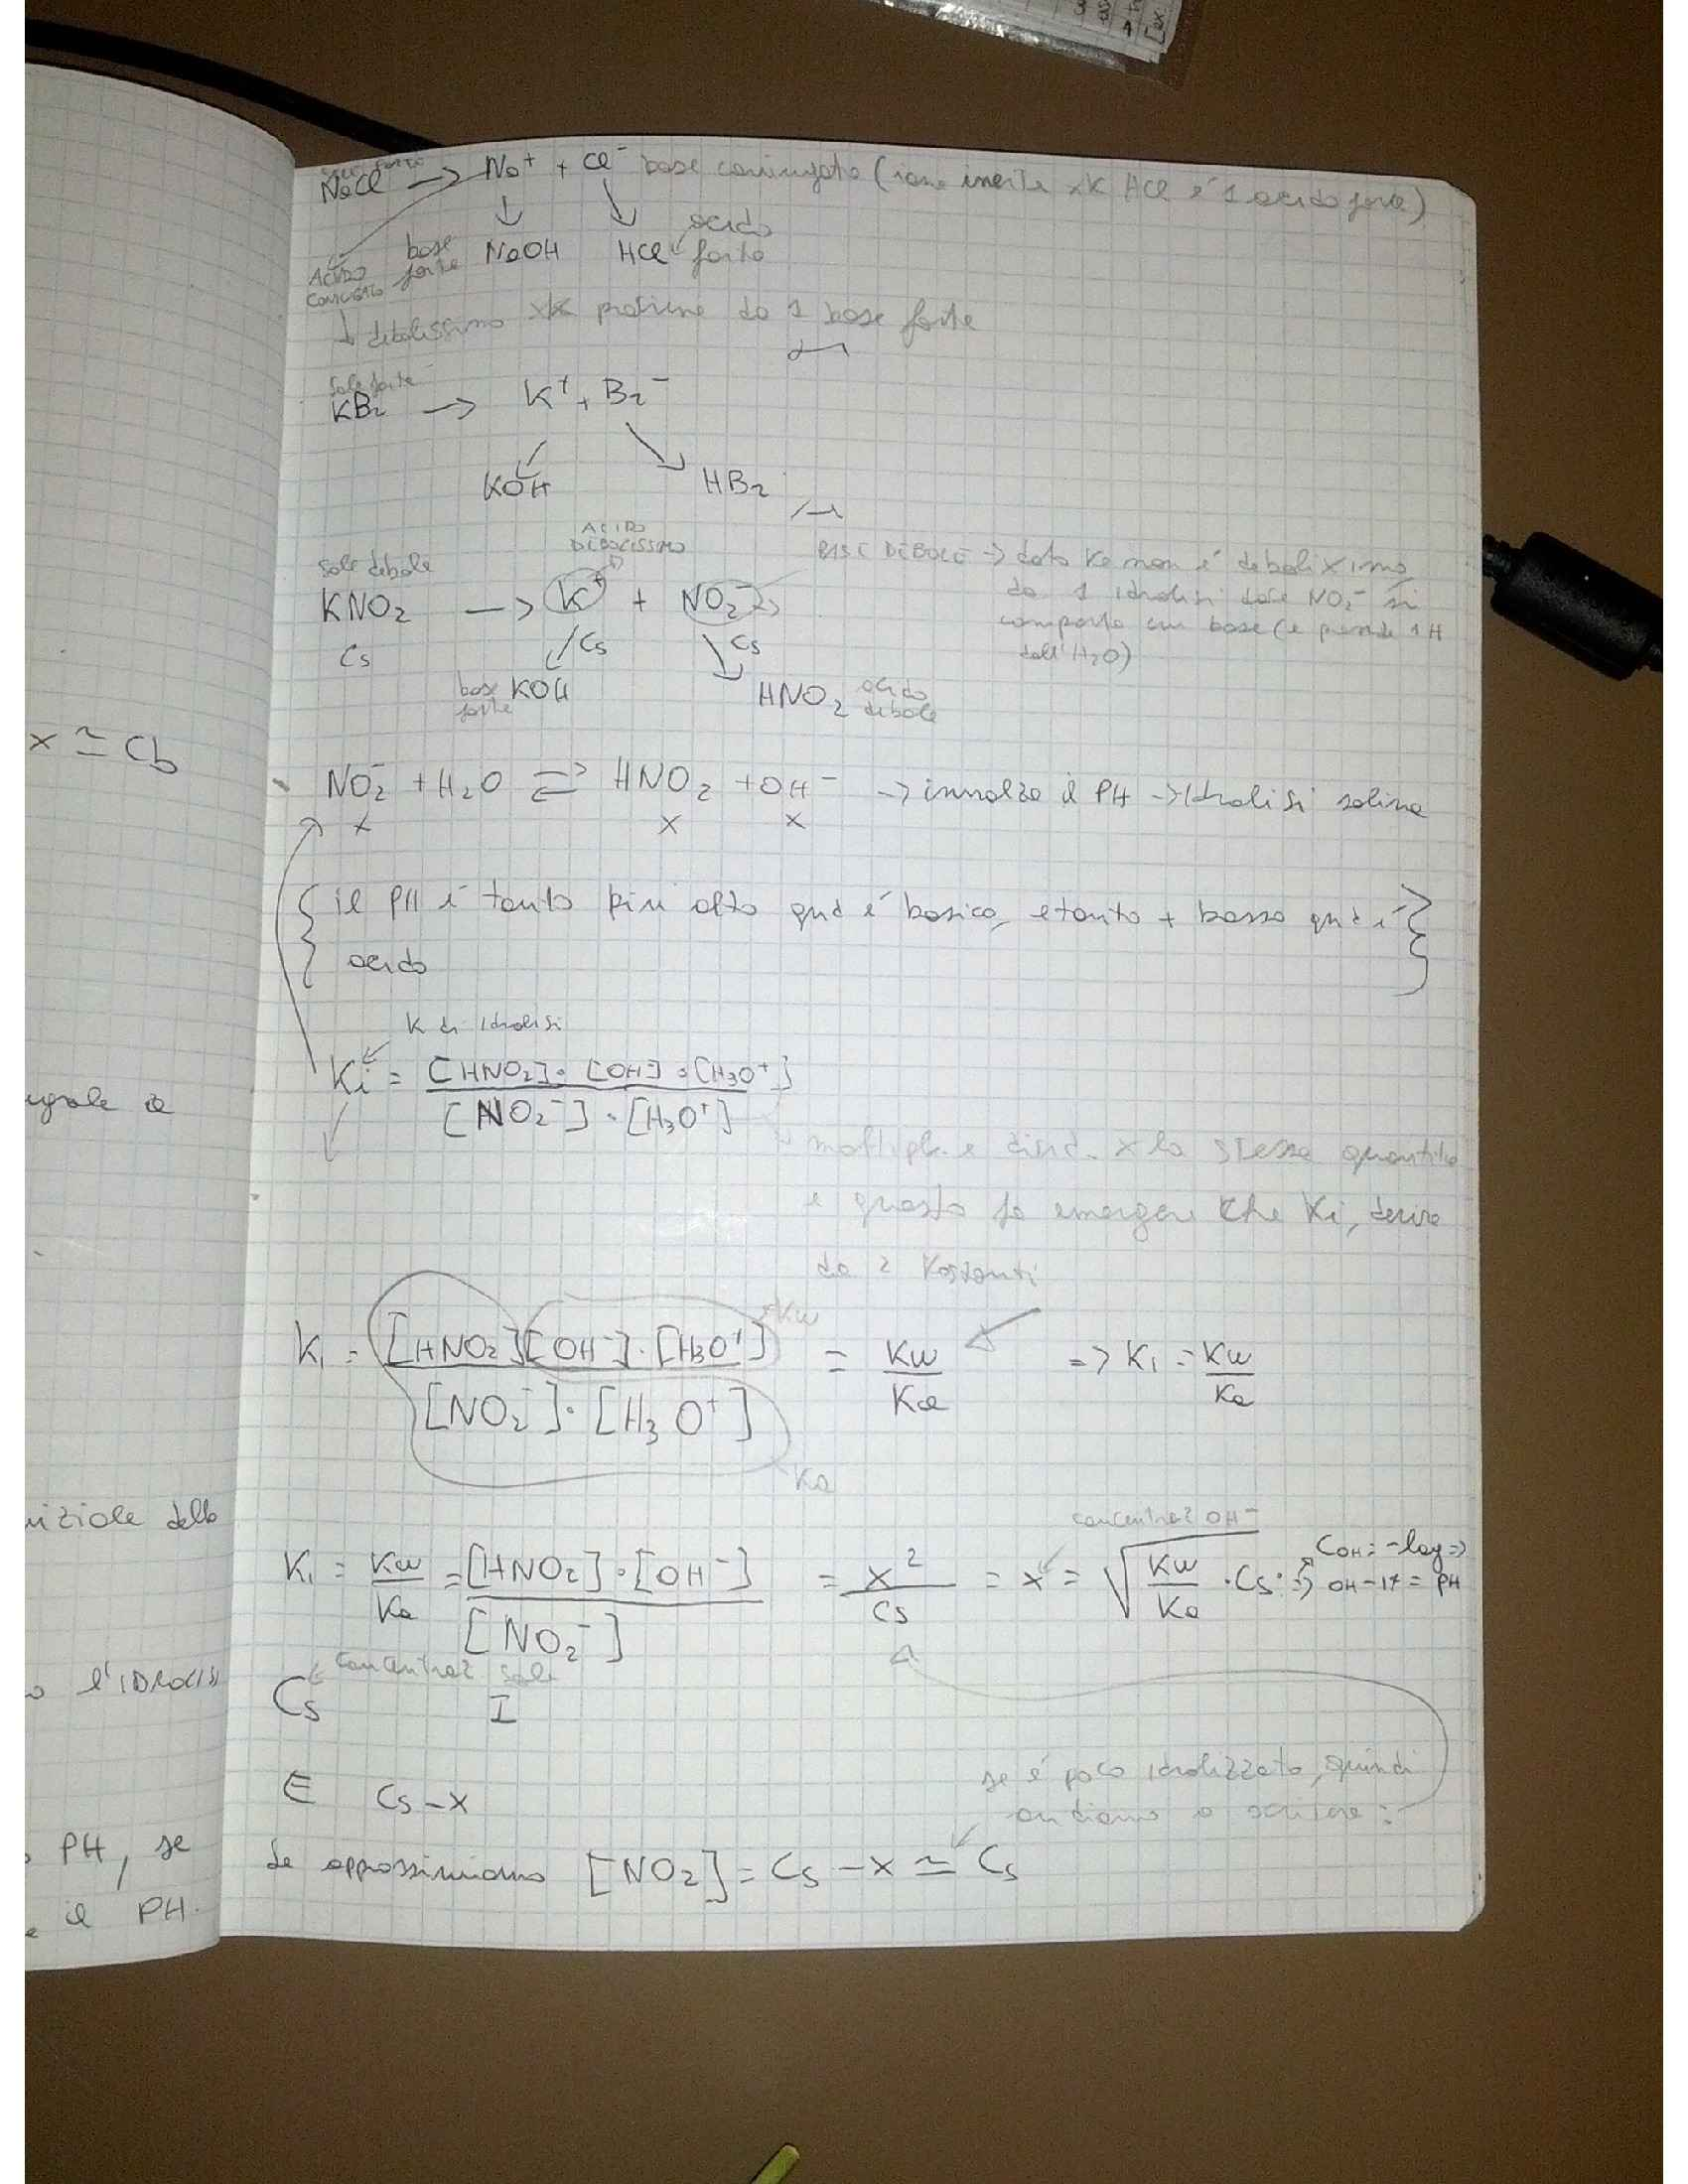 Chimica inorganica - Appunti Pag. 41